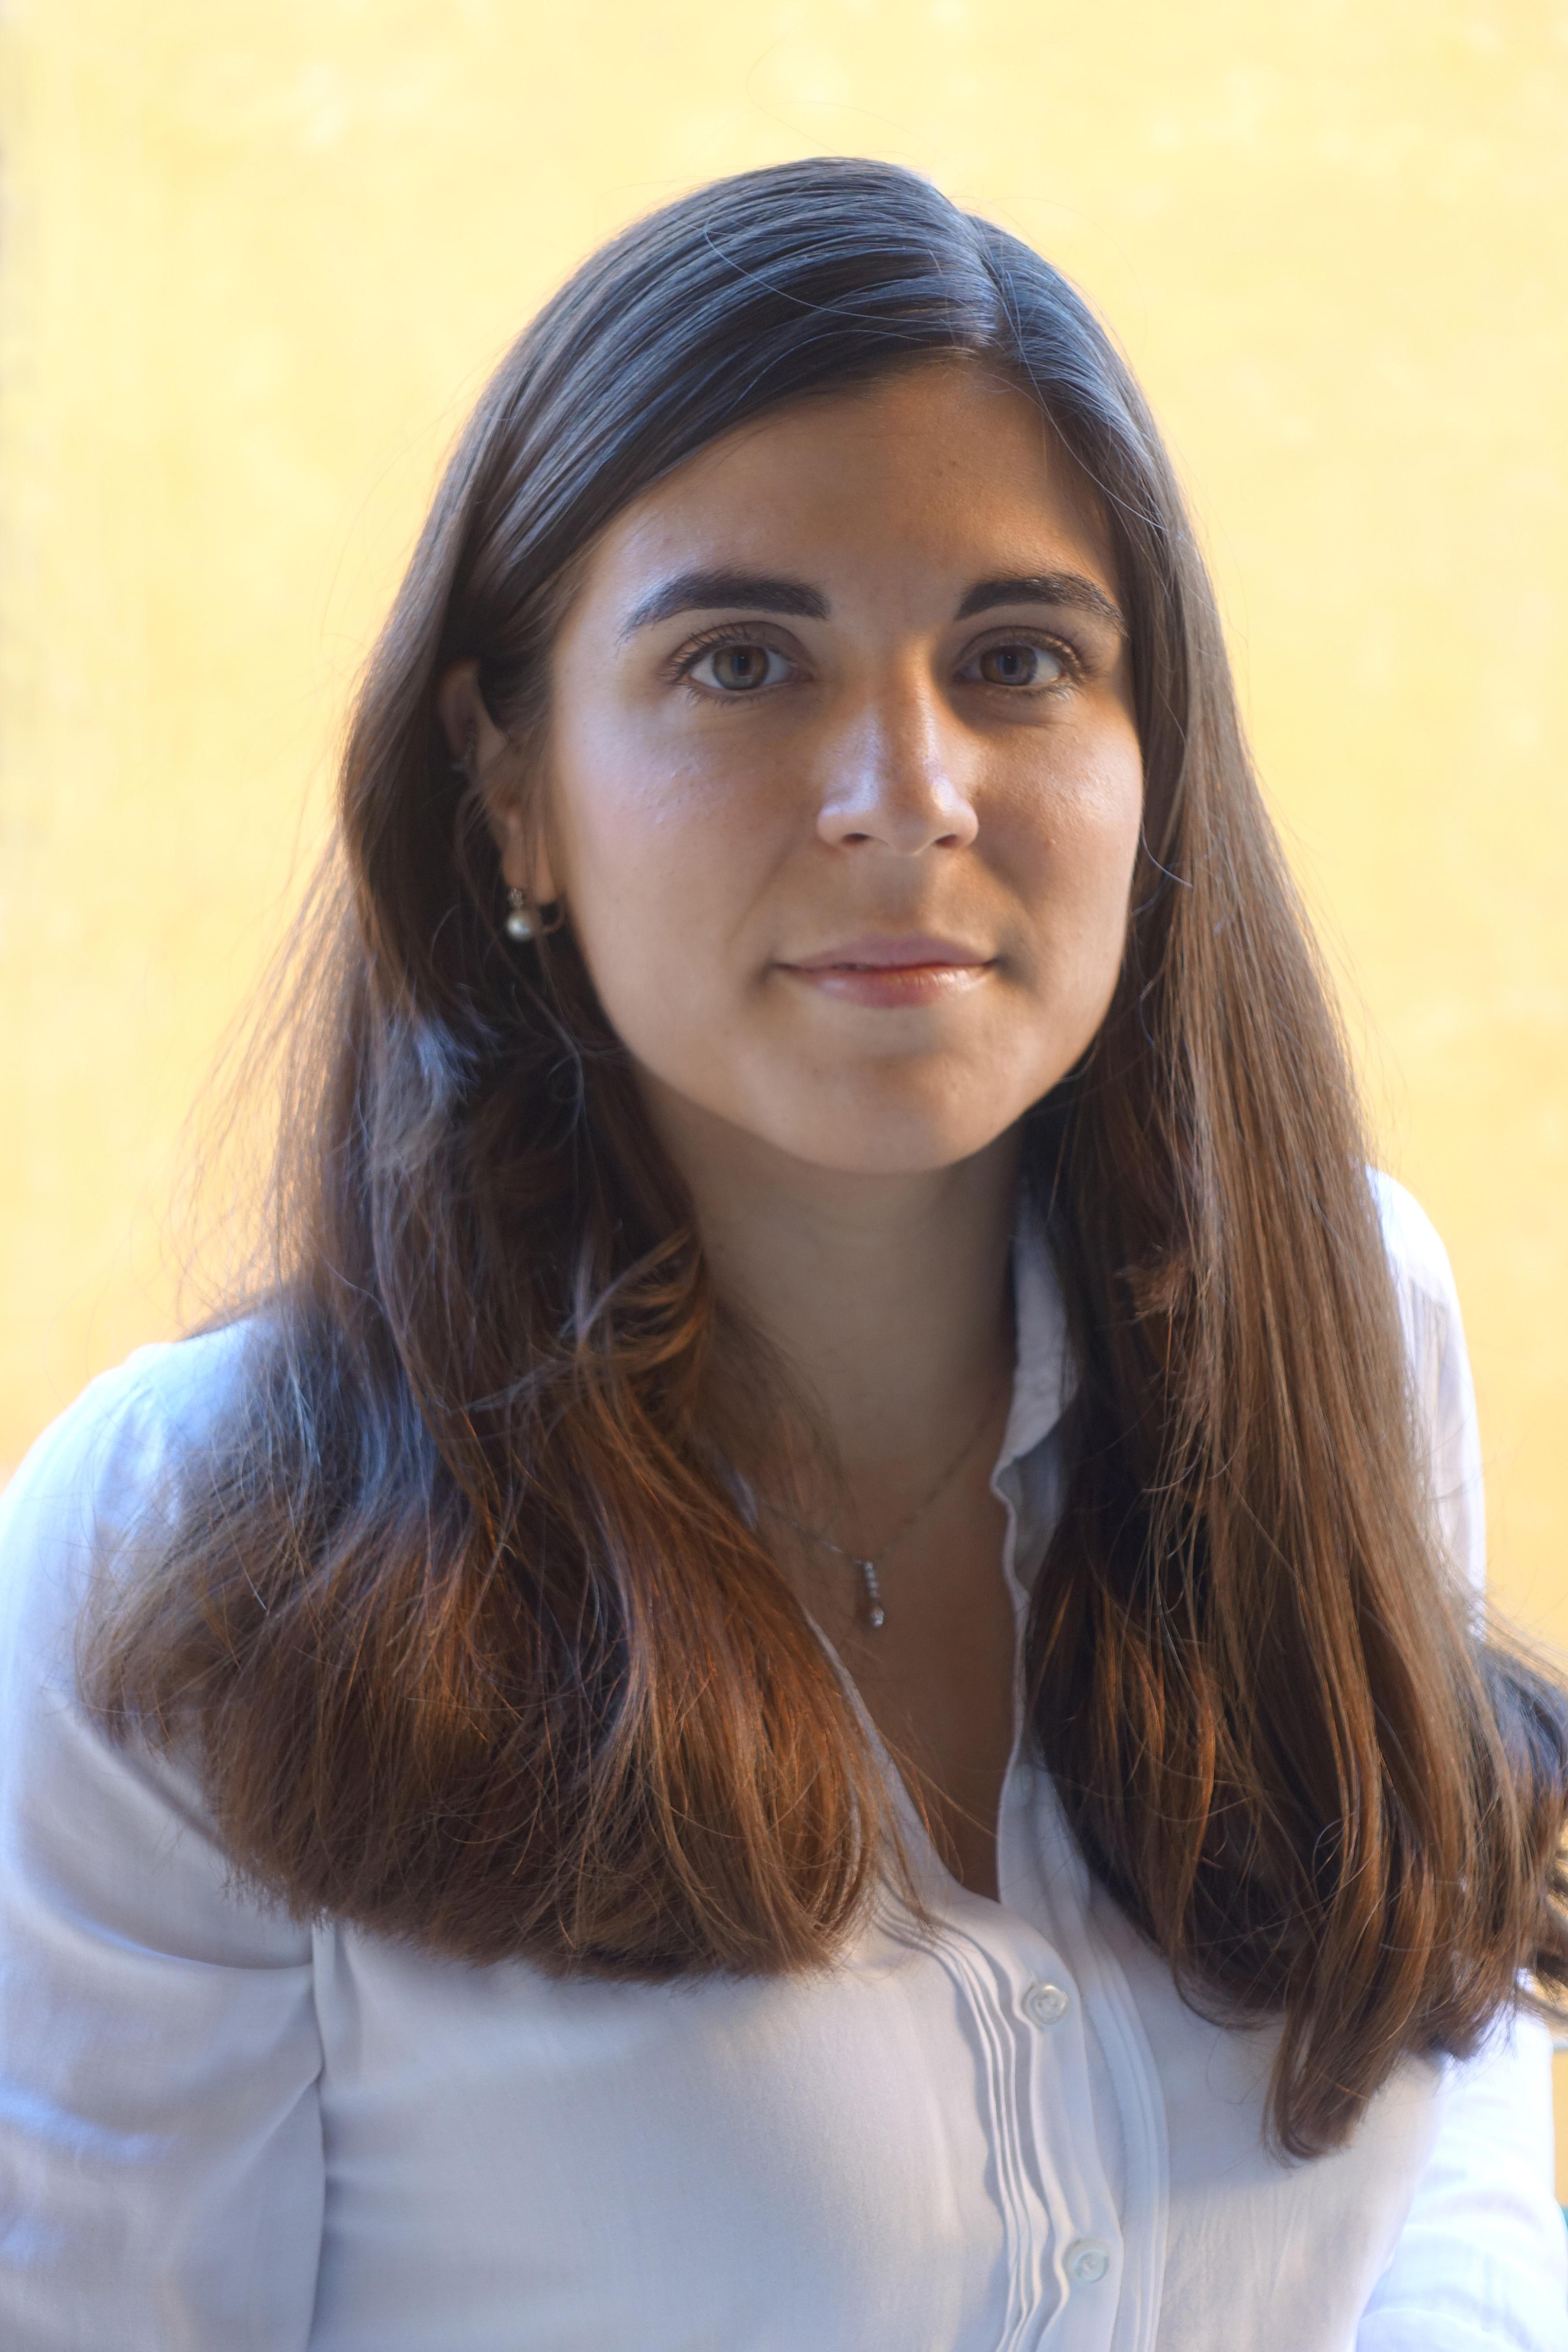 Veronica Valvo